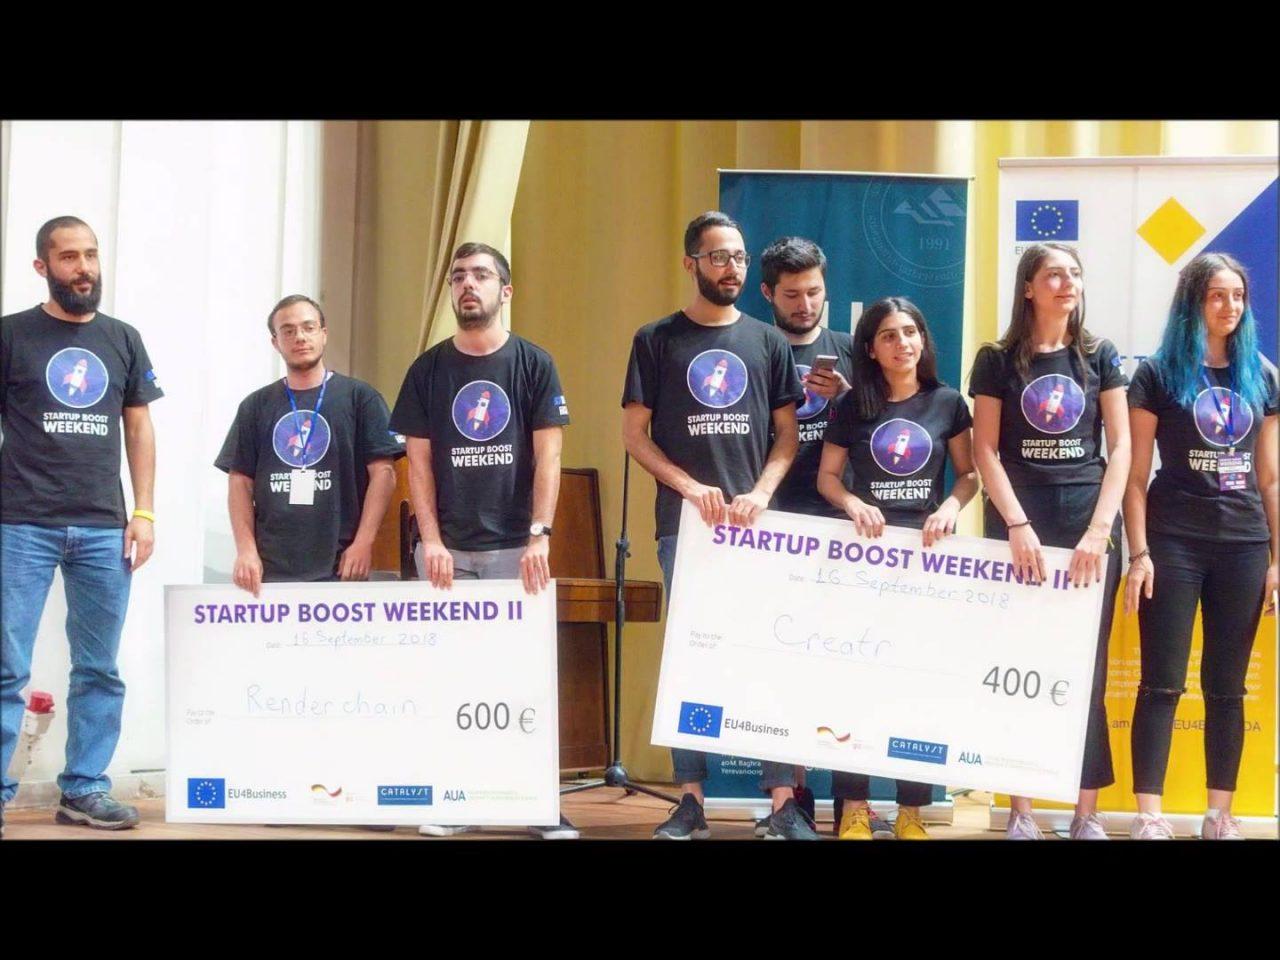 Startup Boost Weekend Vol4 մրցույթ՝ ԵՊՀ-ում